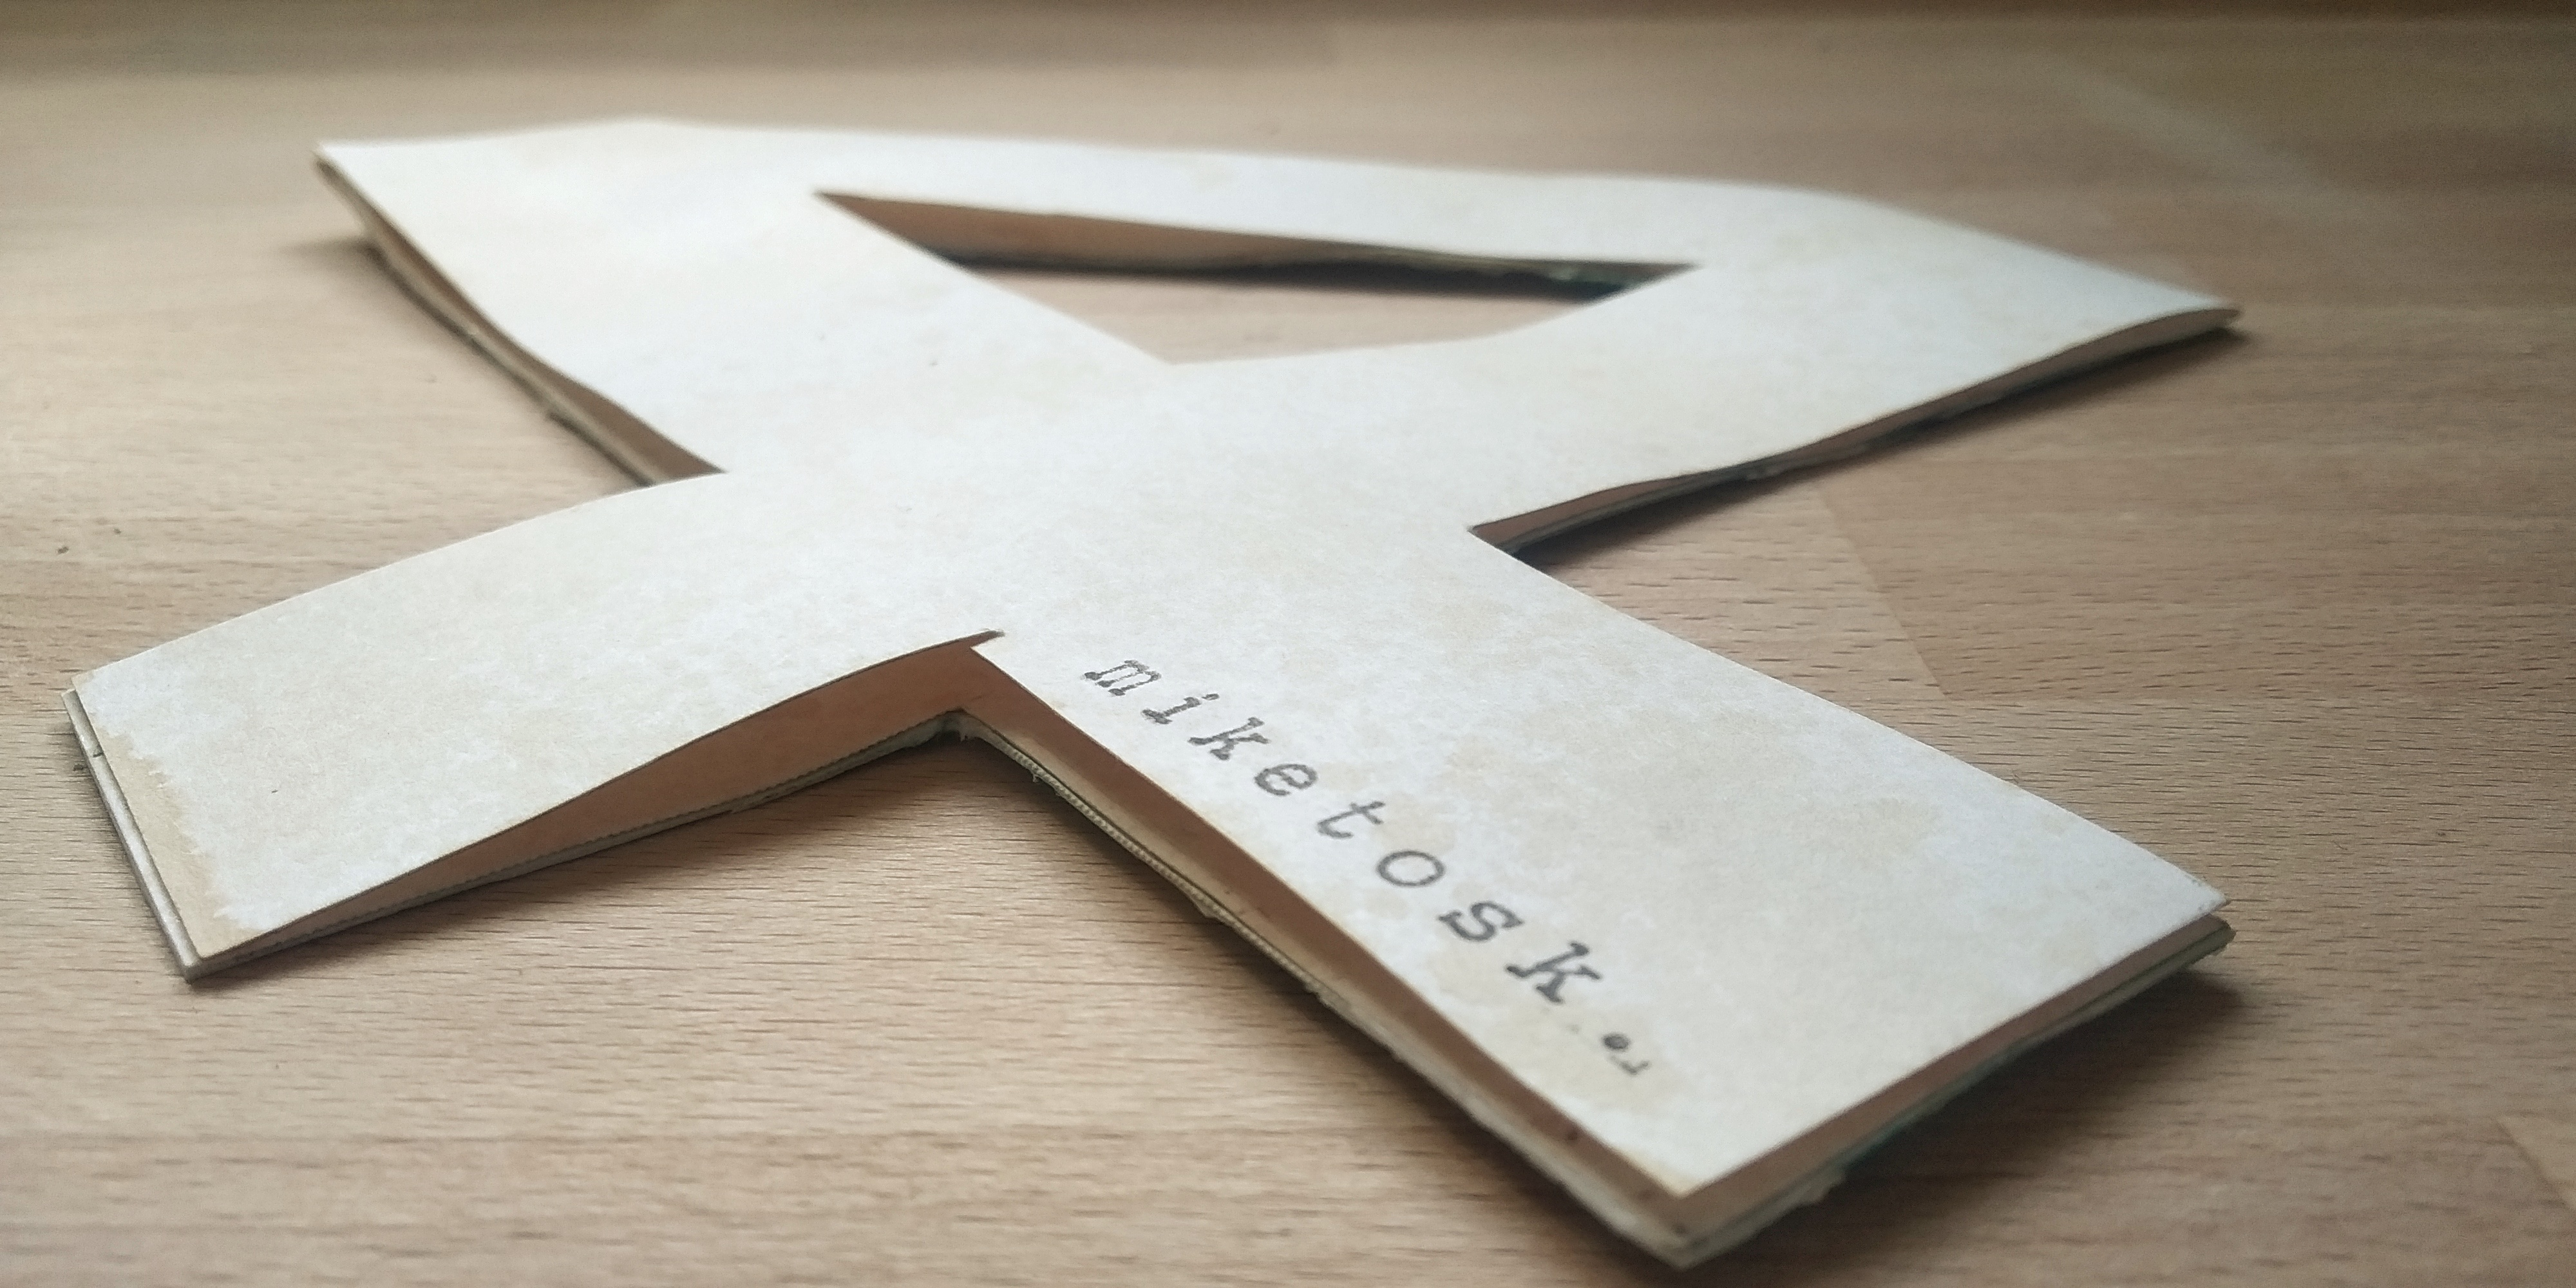 Shaped card lettere & numeri